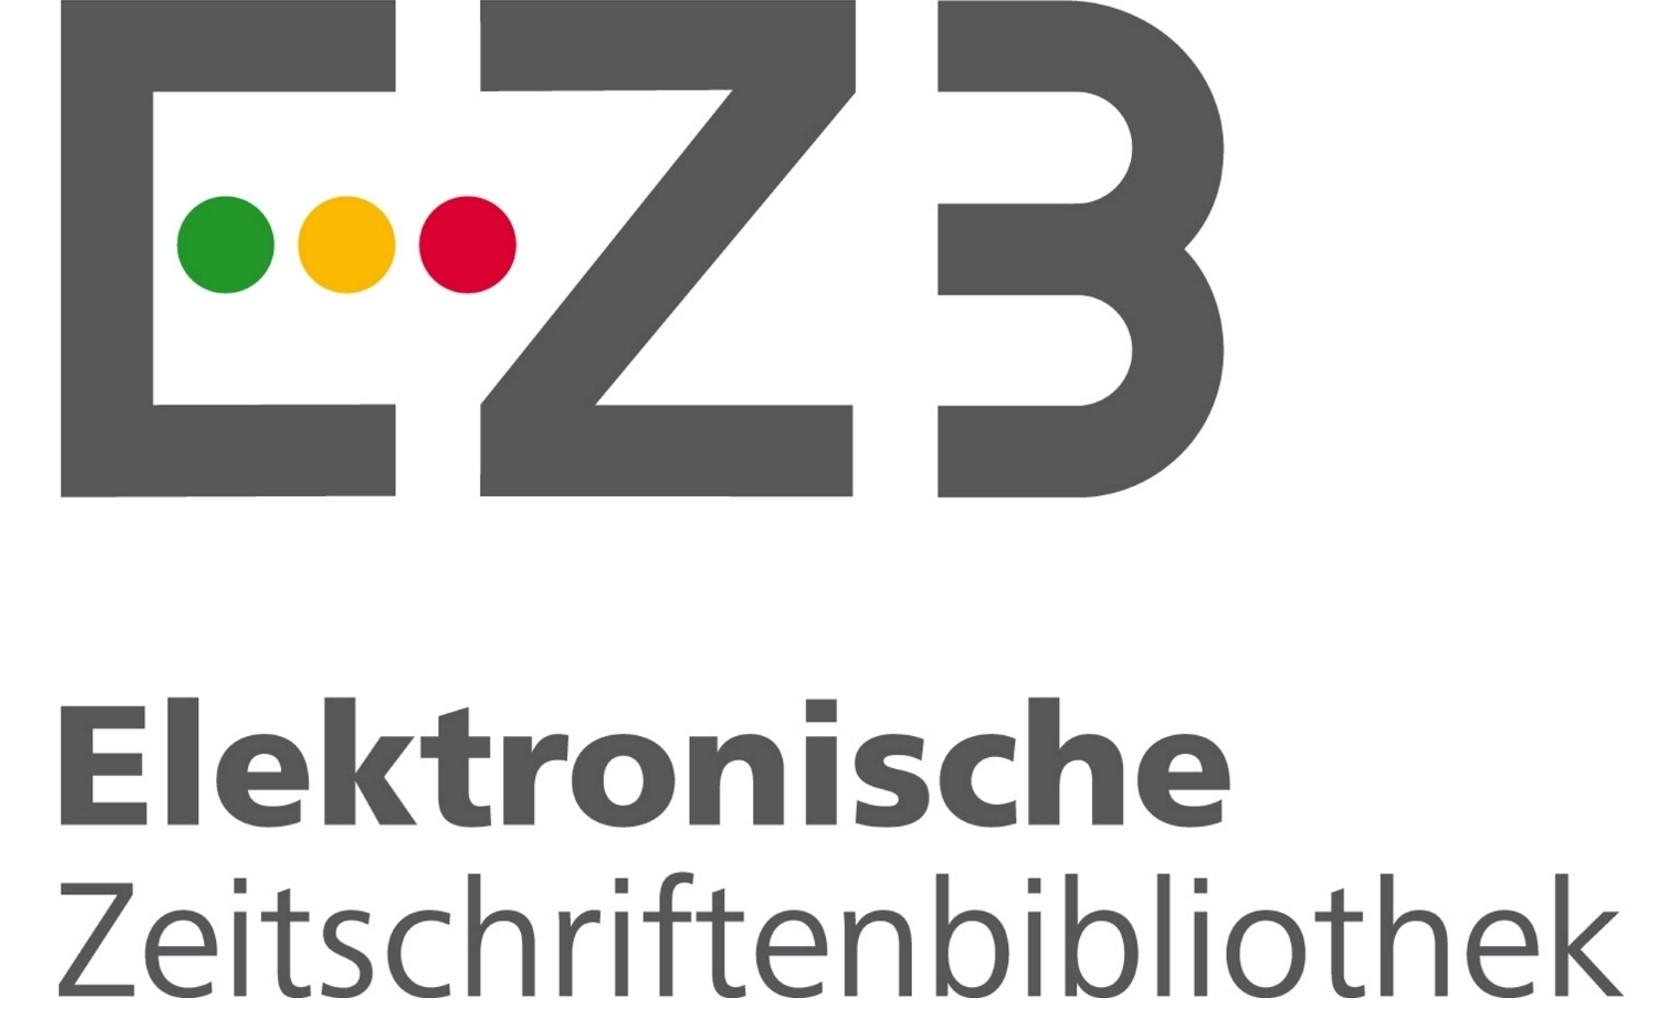 ezb-logo gr.jpg